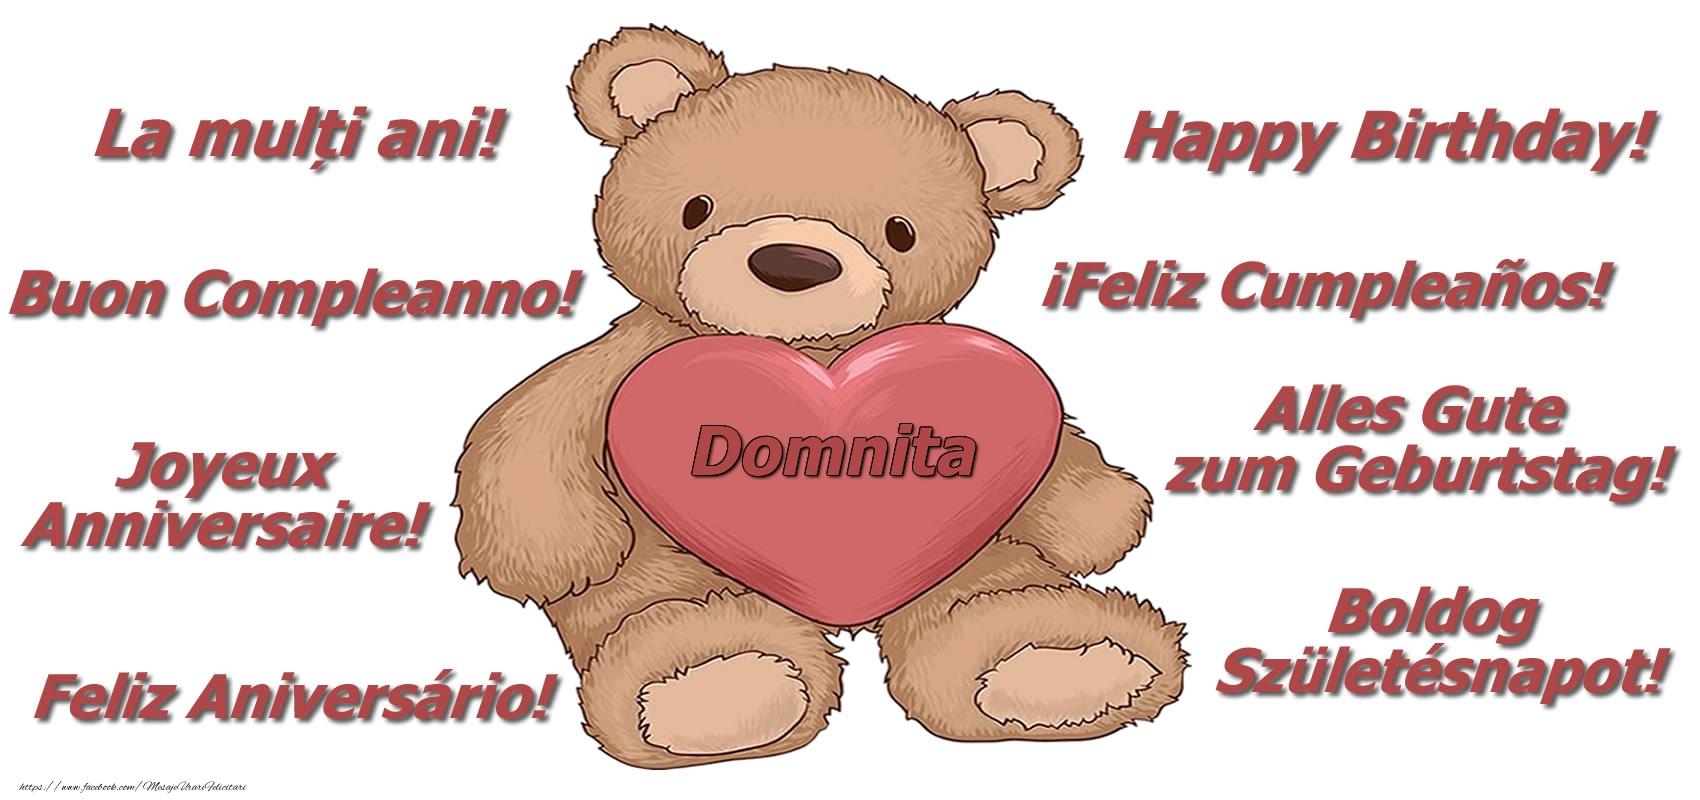 Felicitari de zi de nastere - La multi ani Domnita! - Ursulet